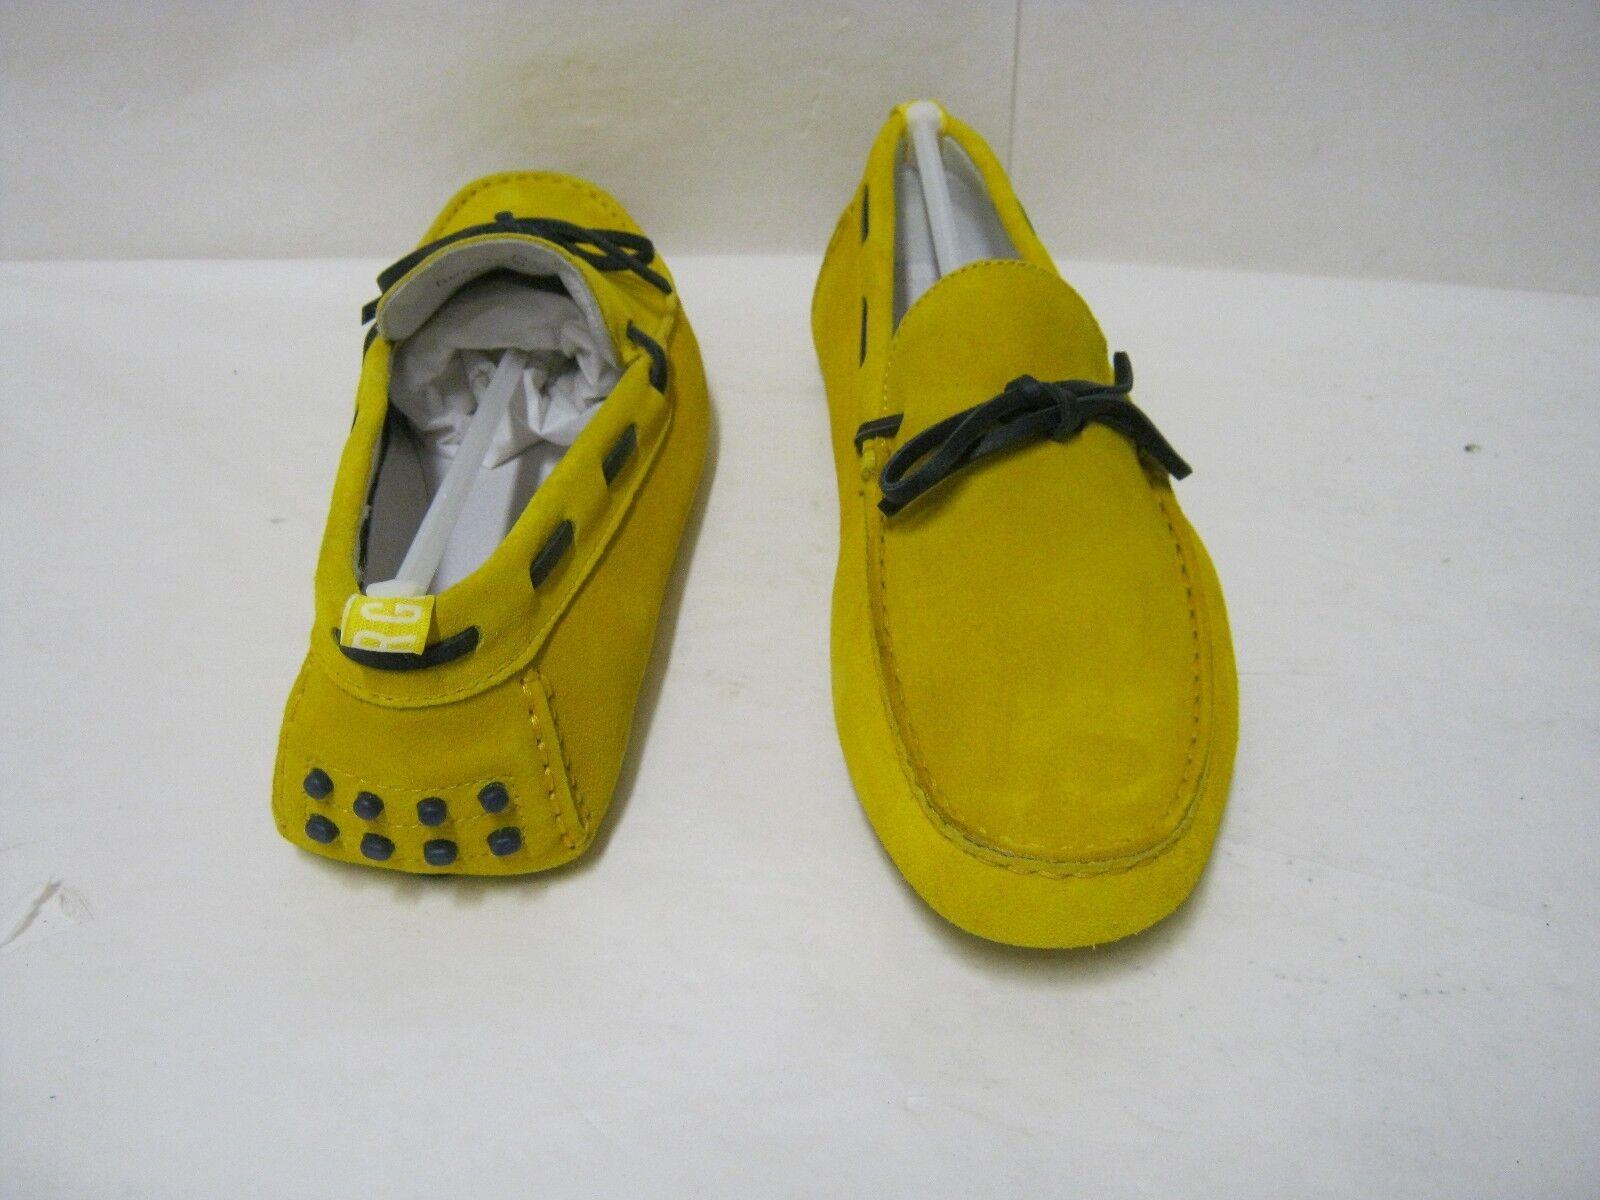 Mocassini pelle uomo BIKKEMBERGS in pelle Mocassini camoscio colore giallo N°45 ec169c